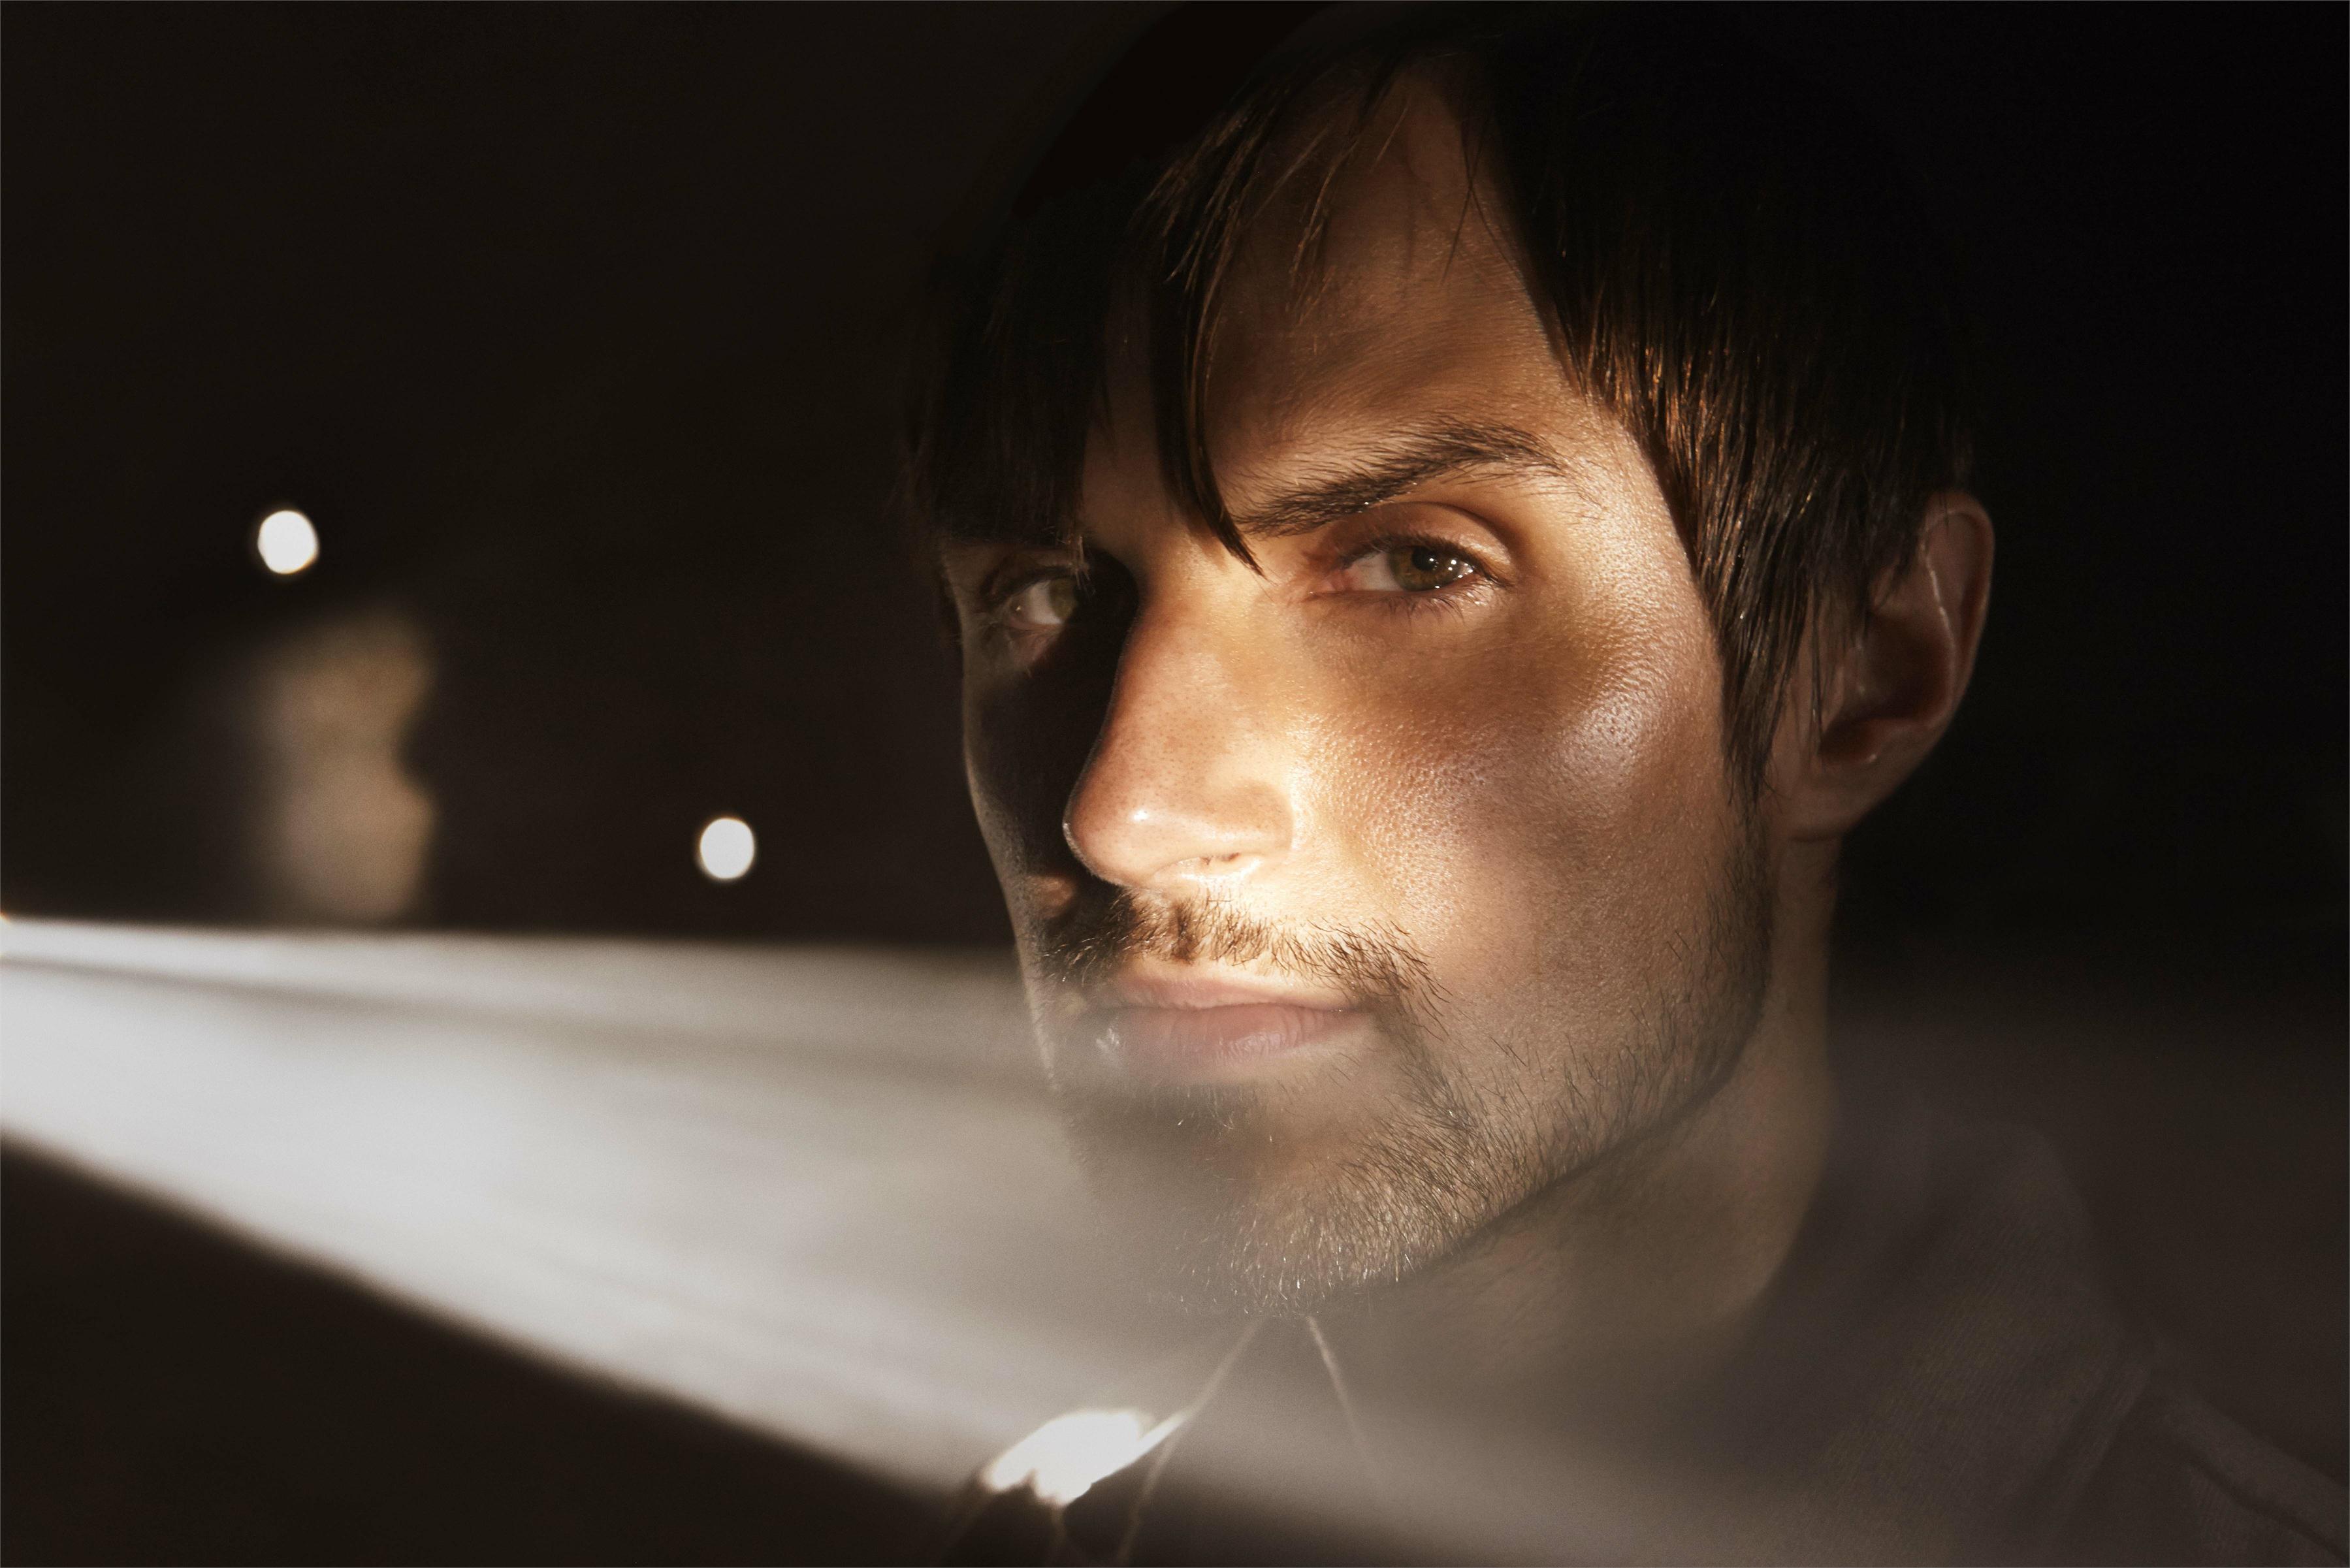 Gareth-The-Walking-Dead-5-Temporada-Personagens-HQ-011